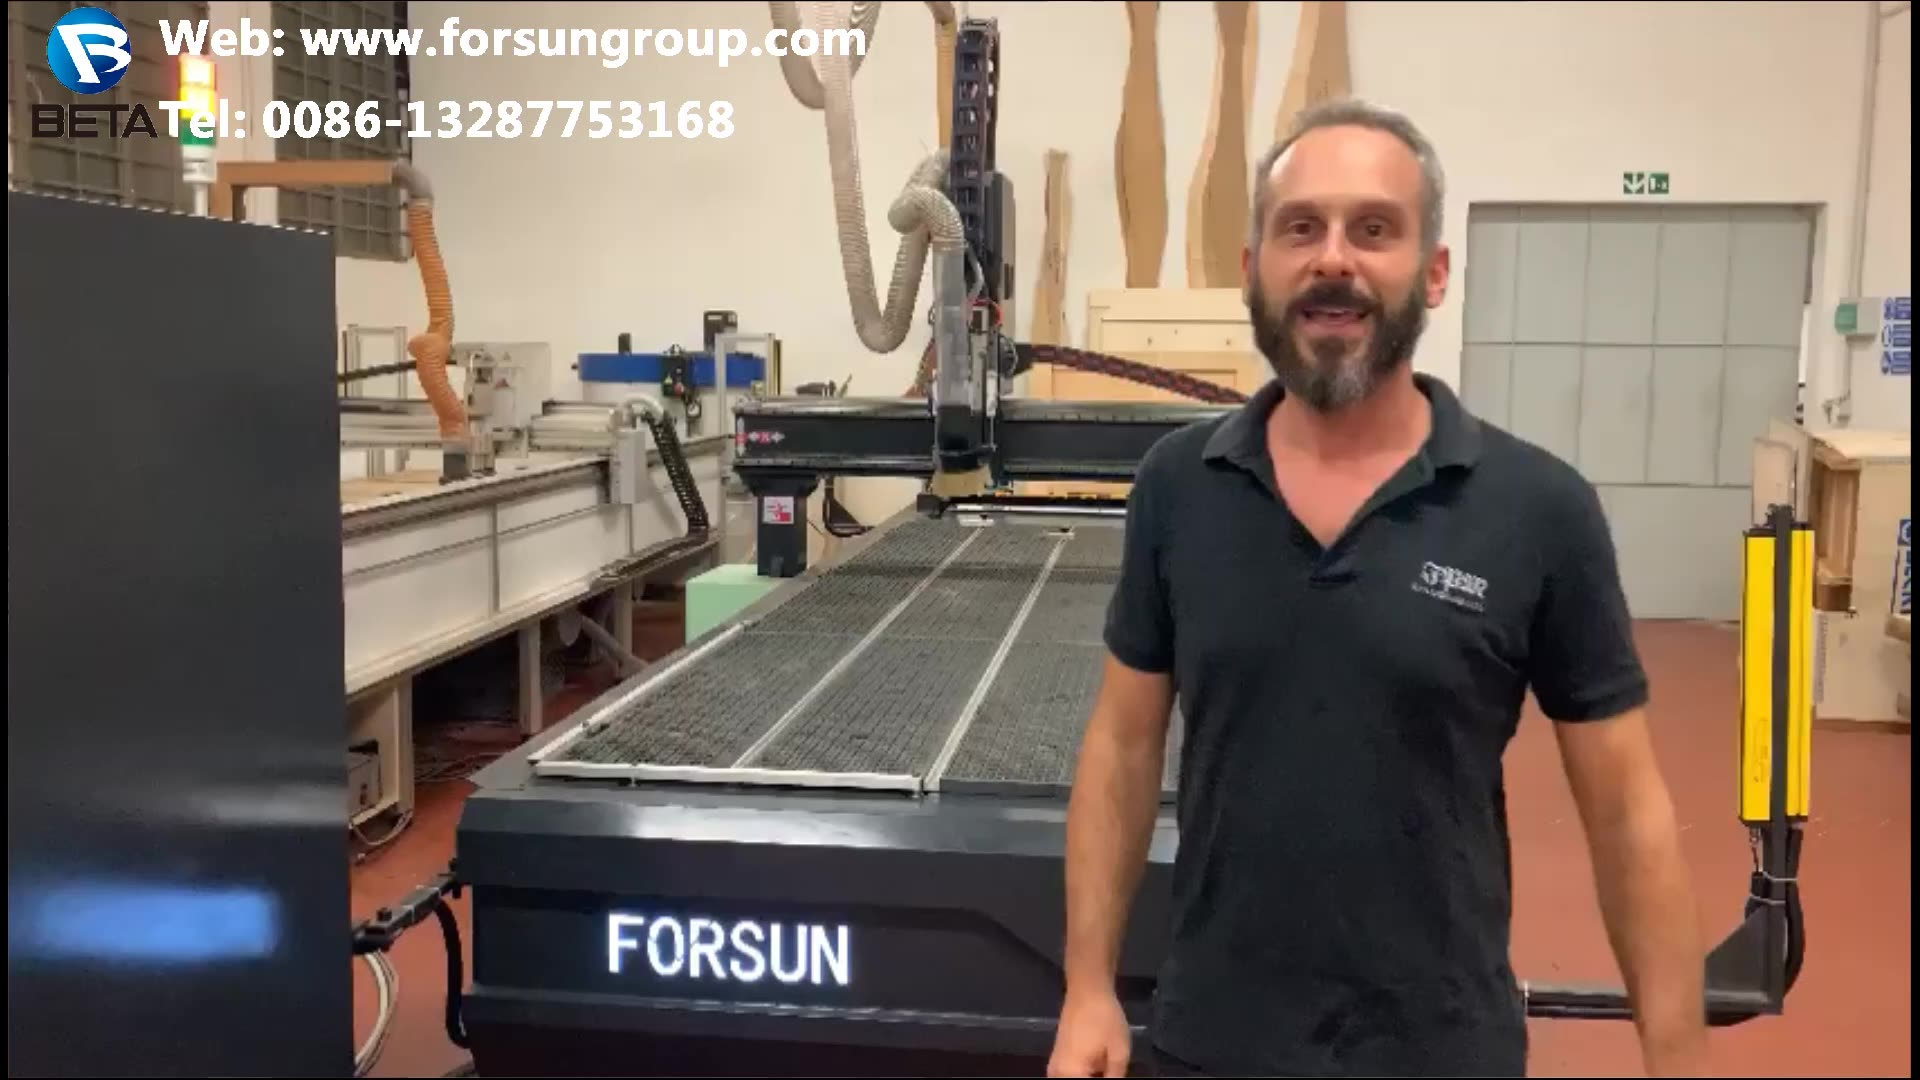 30% discount FORSUN CNC  4 axis 3d cnc router woodworking machine 6 Heads 4 Axis Cylinder Wood CNC Router